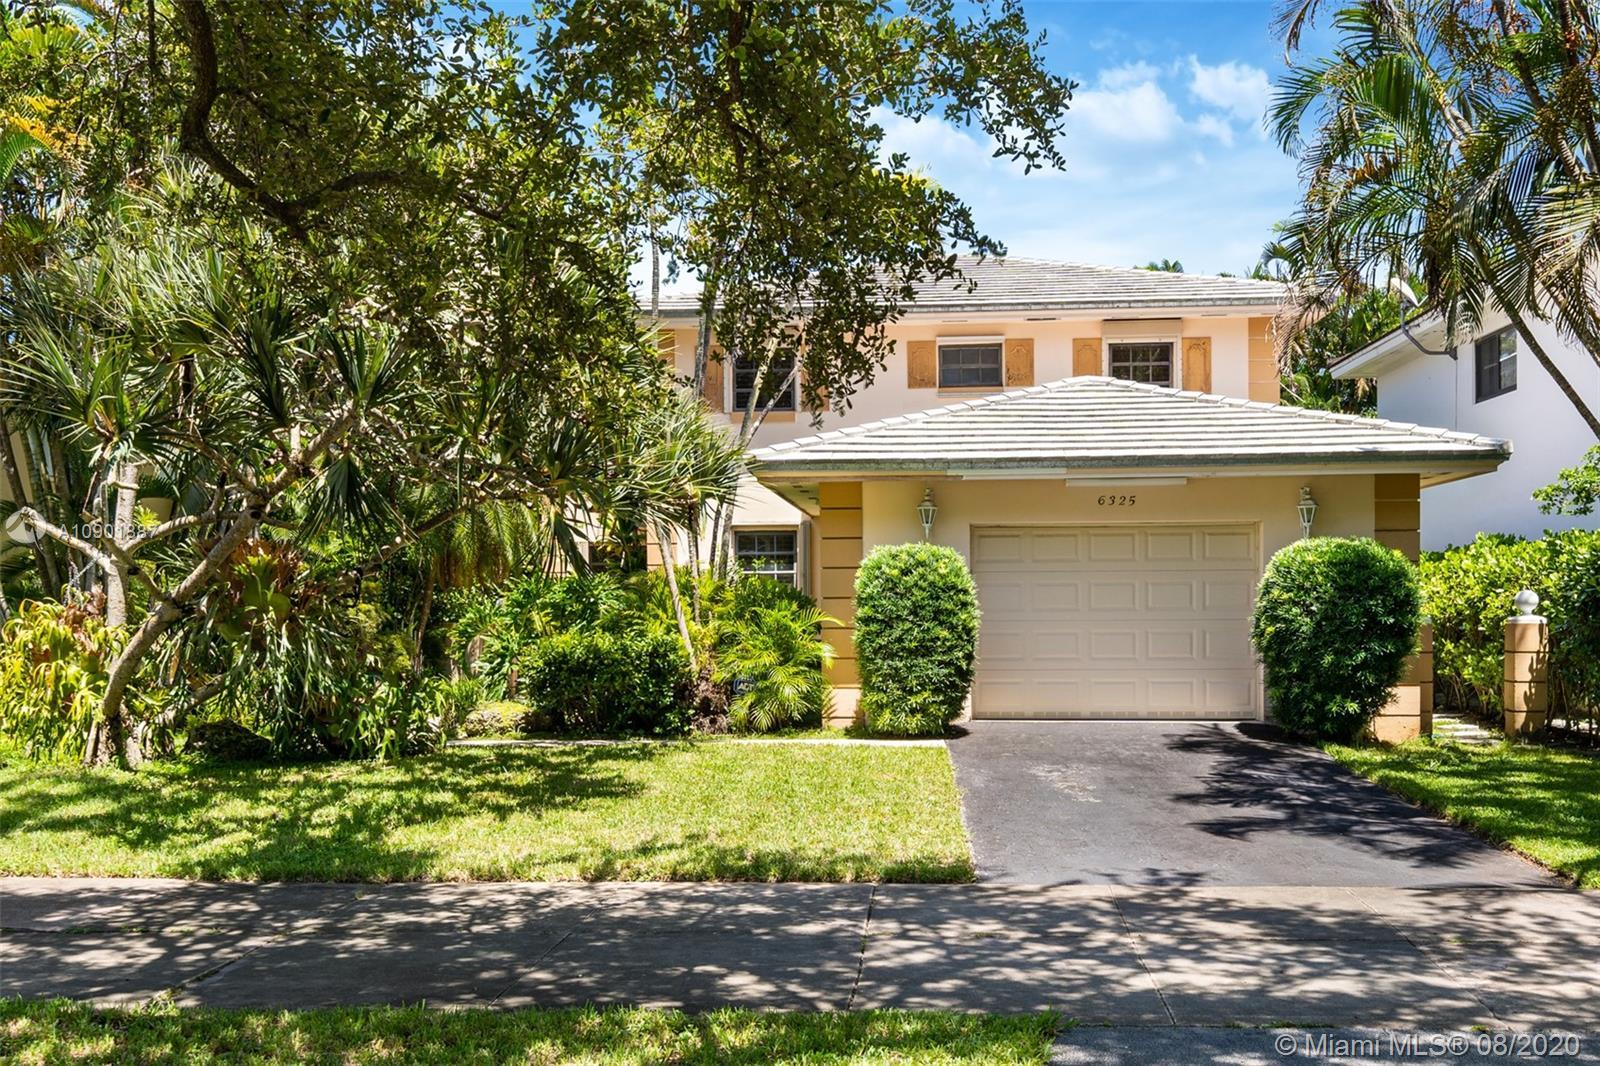 South Miami - 6325 Maynada St, Coral Gables, FL 33146